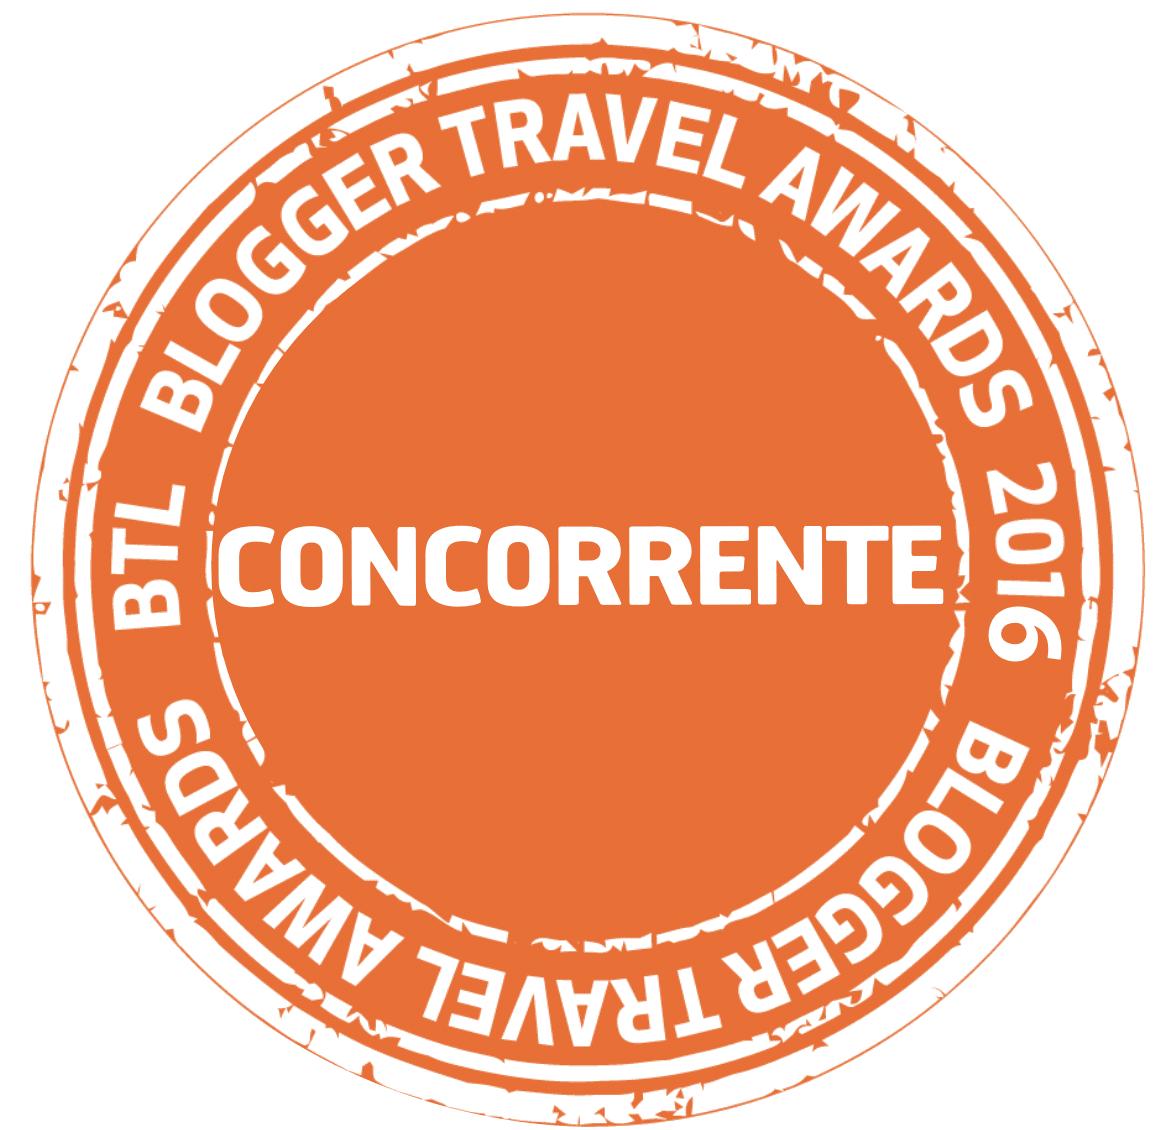 Blogger Travel Awards 2016